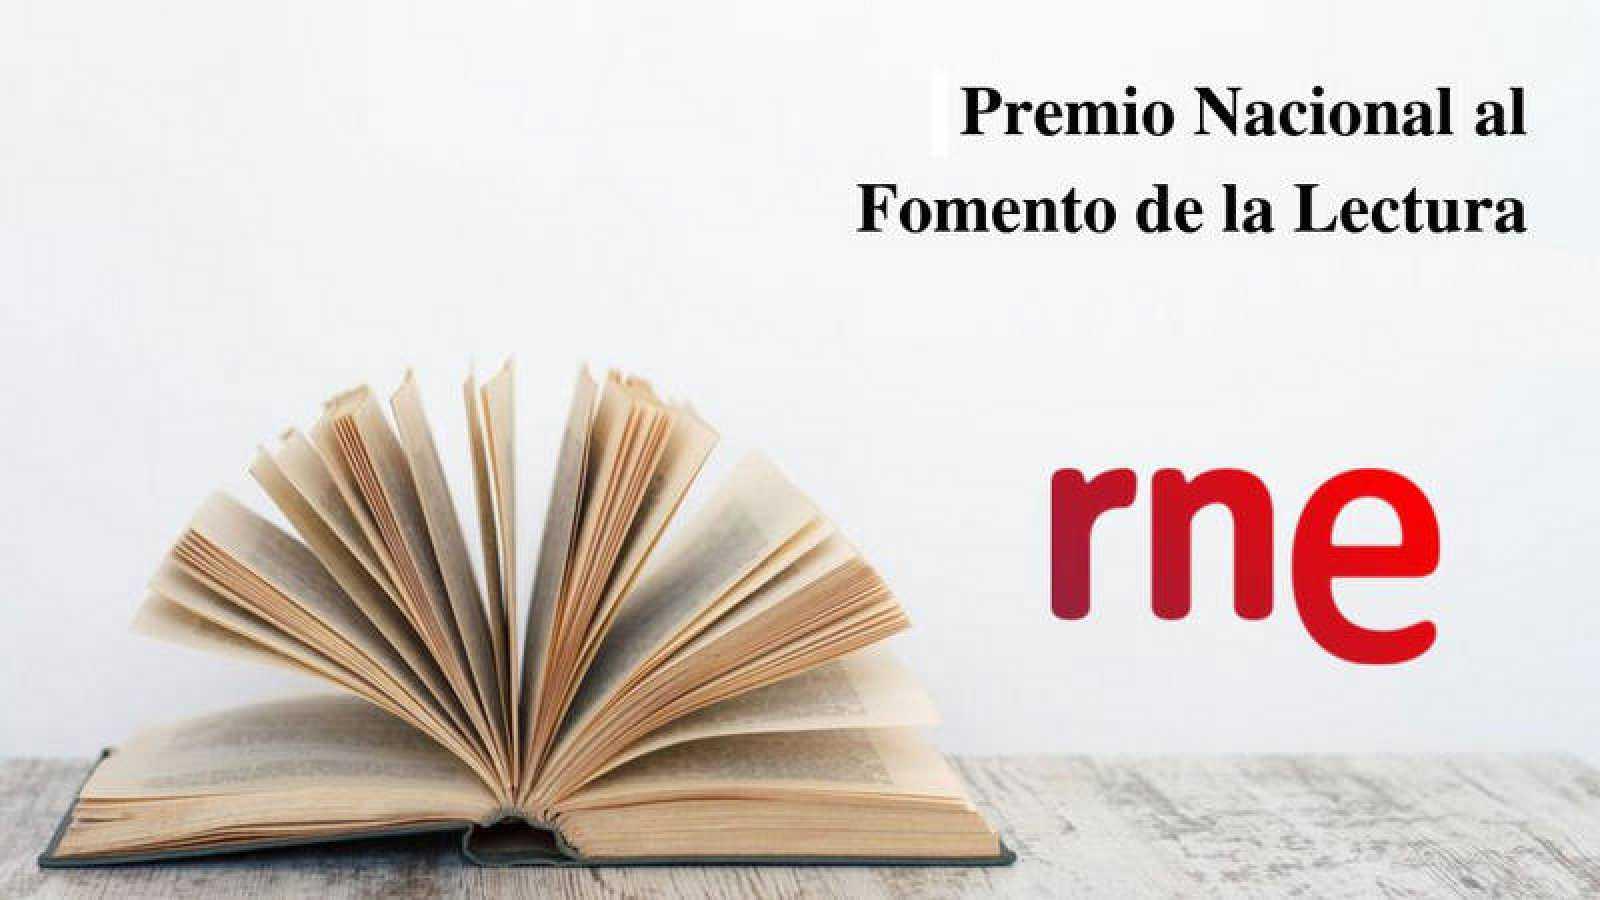 RNE, Premio Nacional al Fomento de la Lectura 2019.